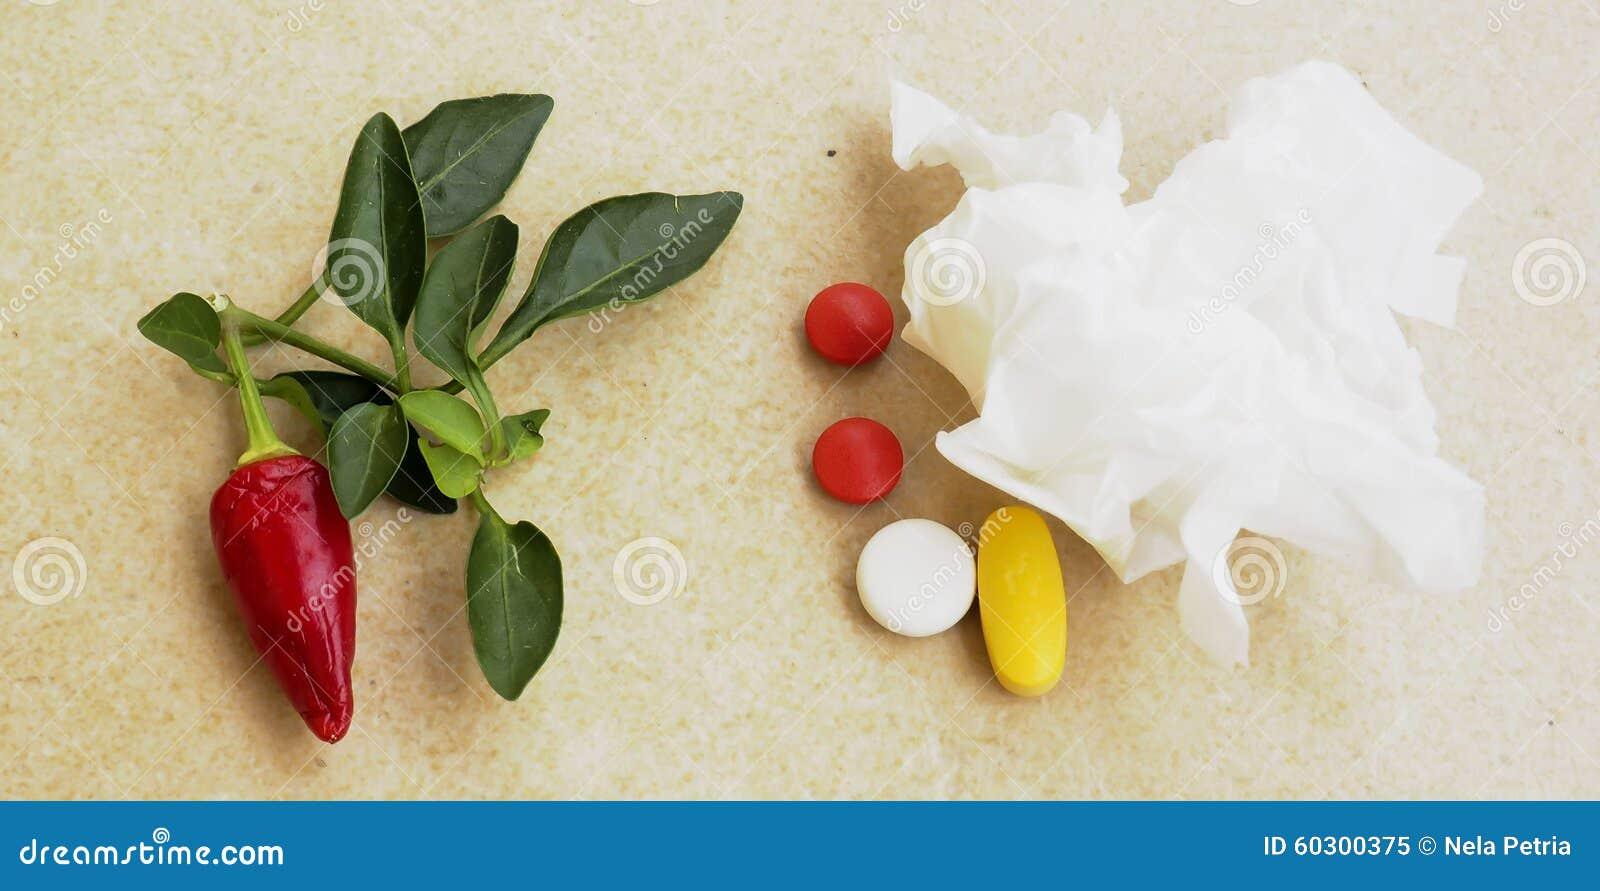 Natural Remedy Vs Medicine